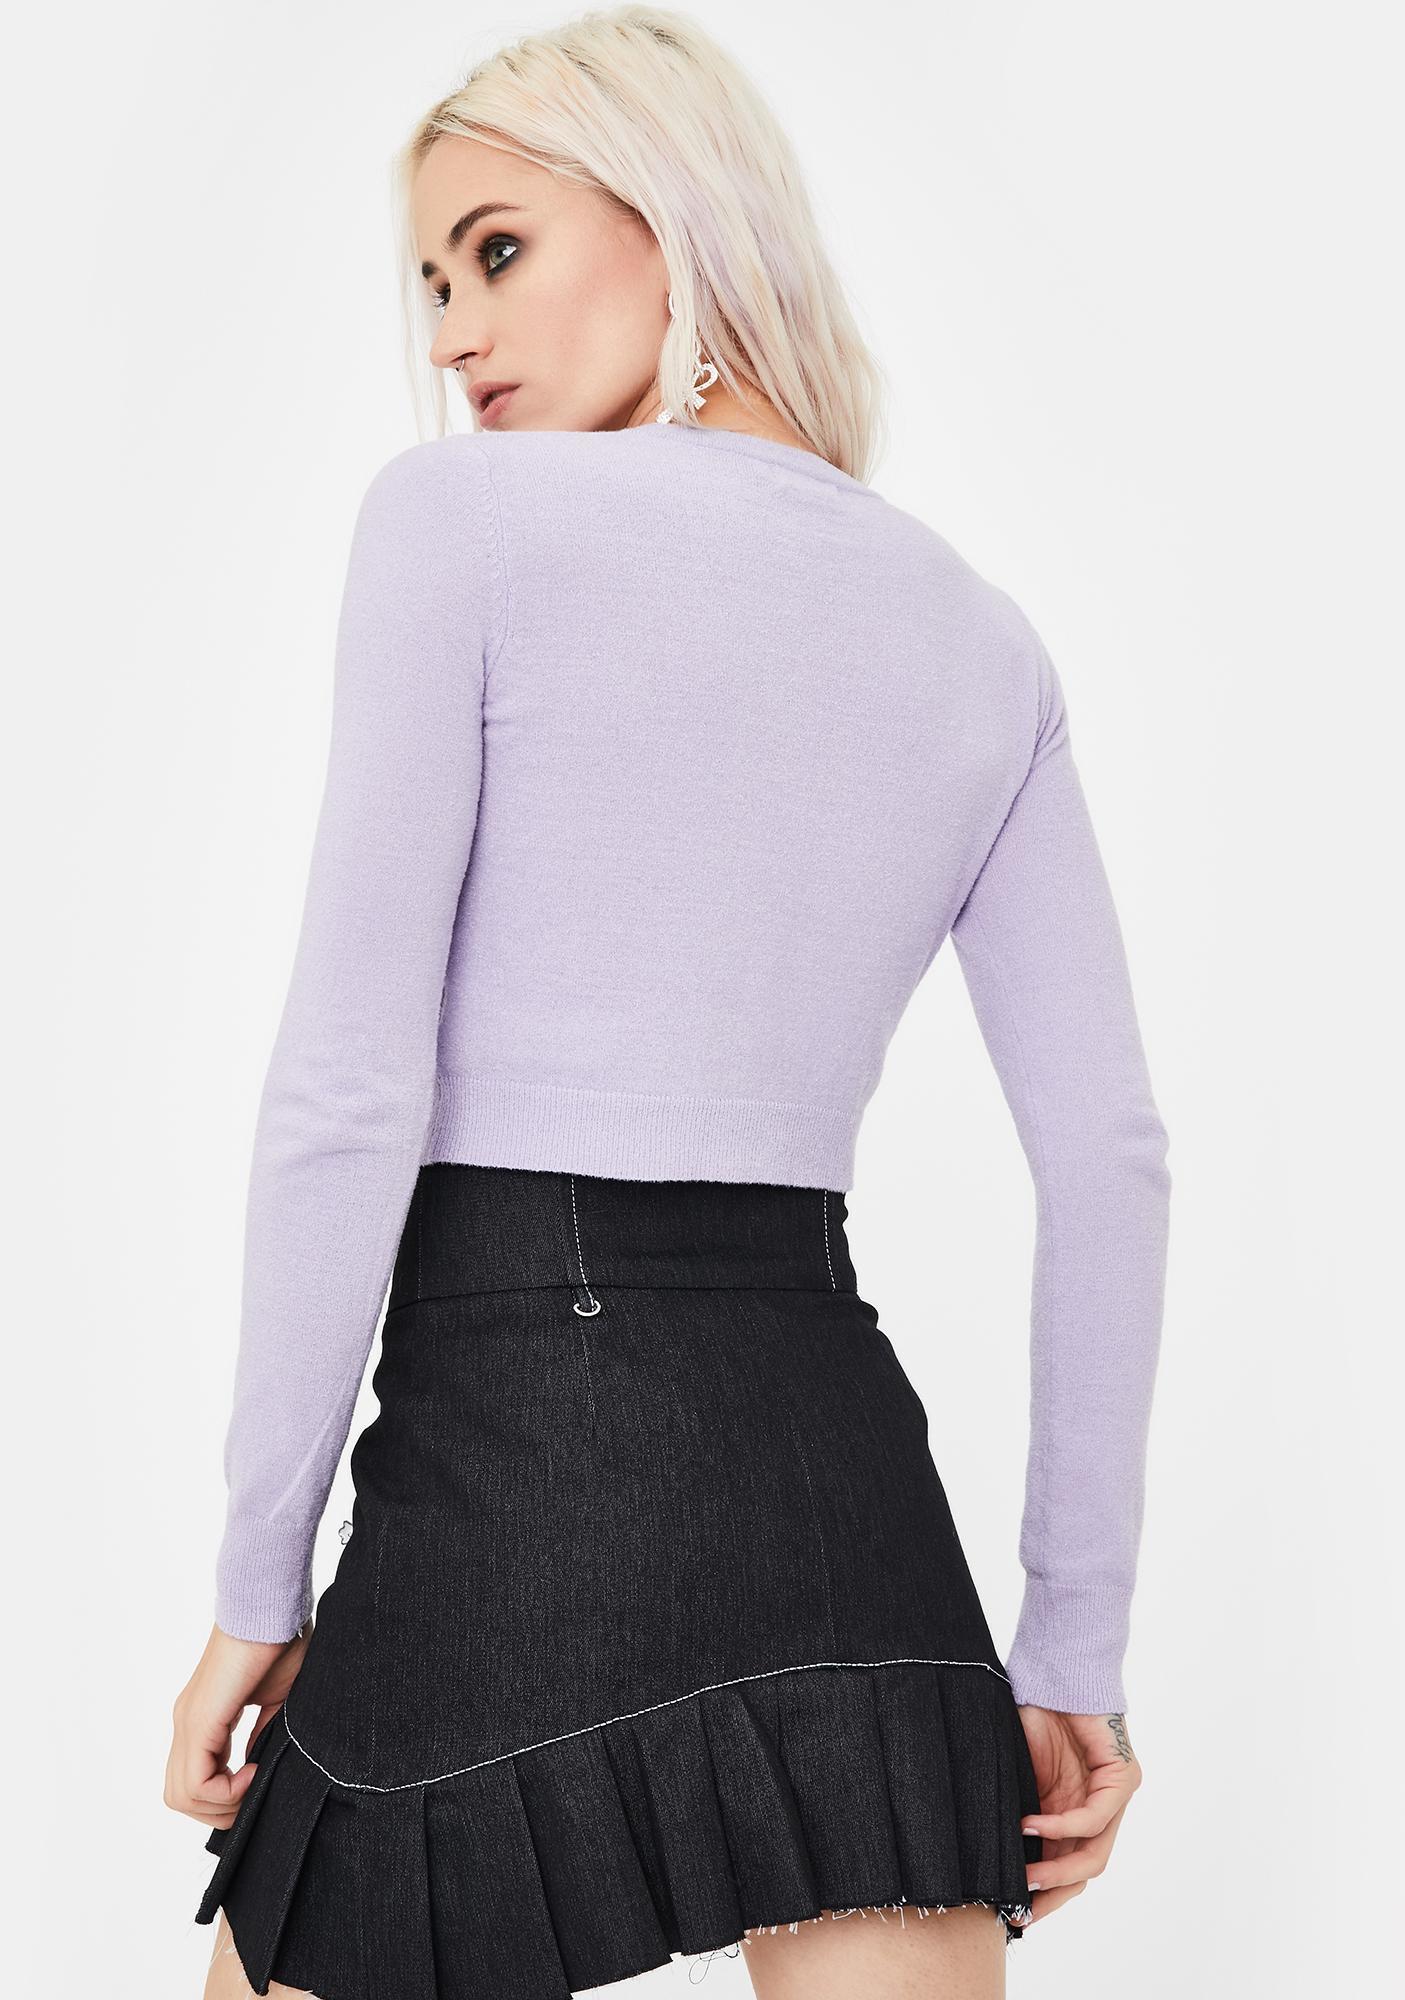 No Dress Lilac Cropped Knit Cardigan